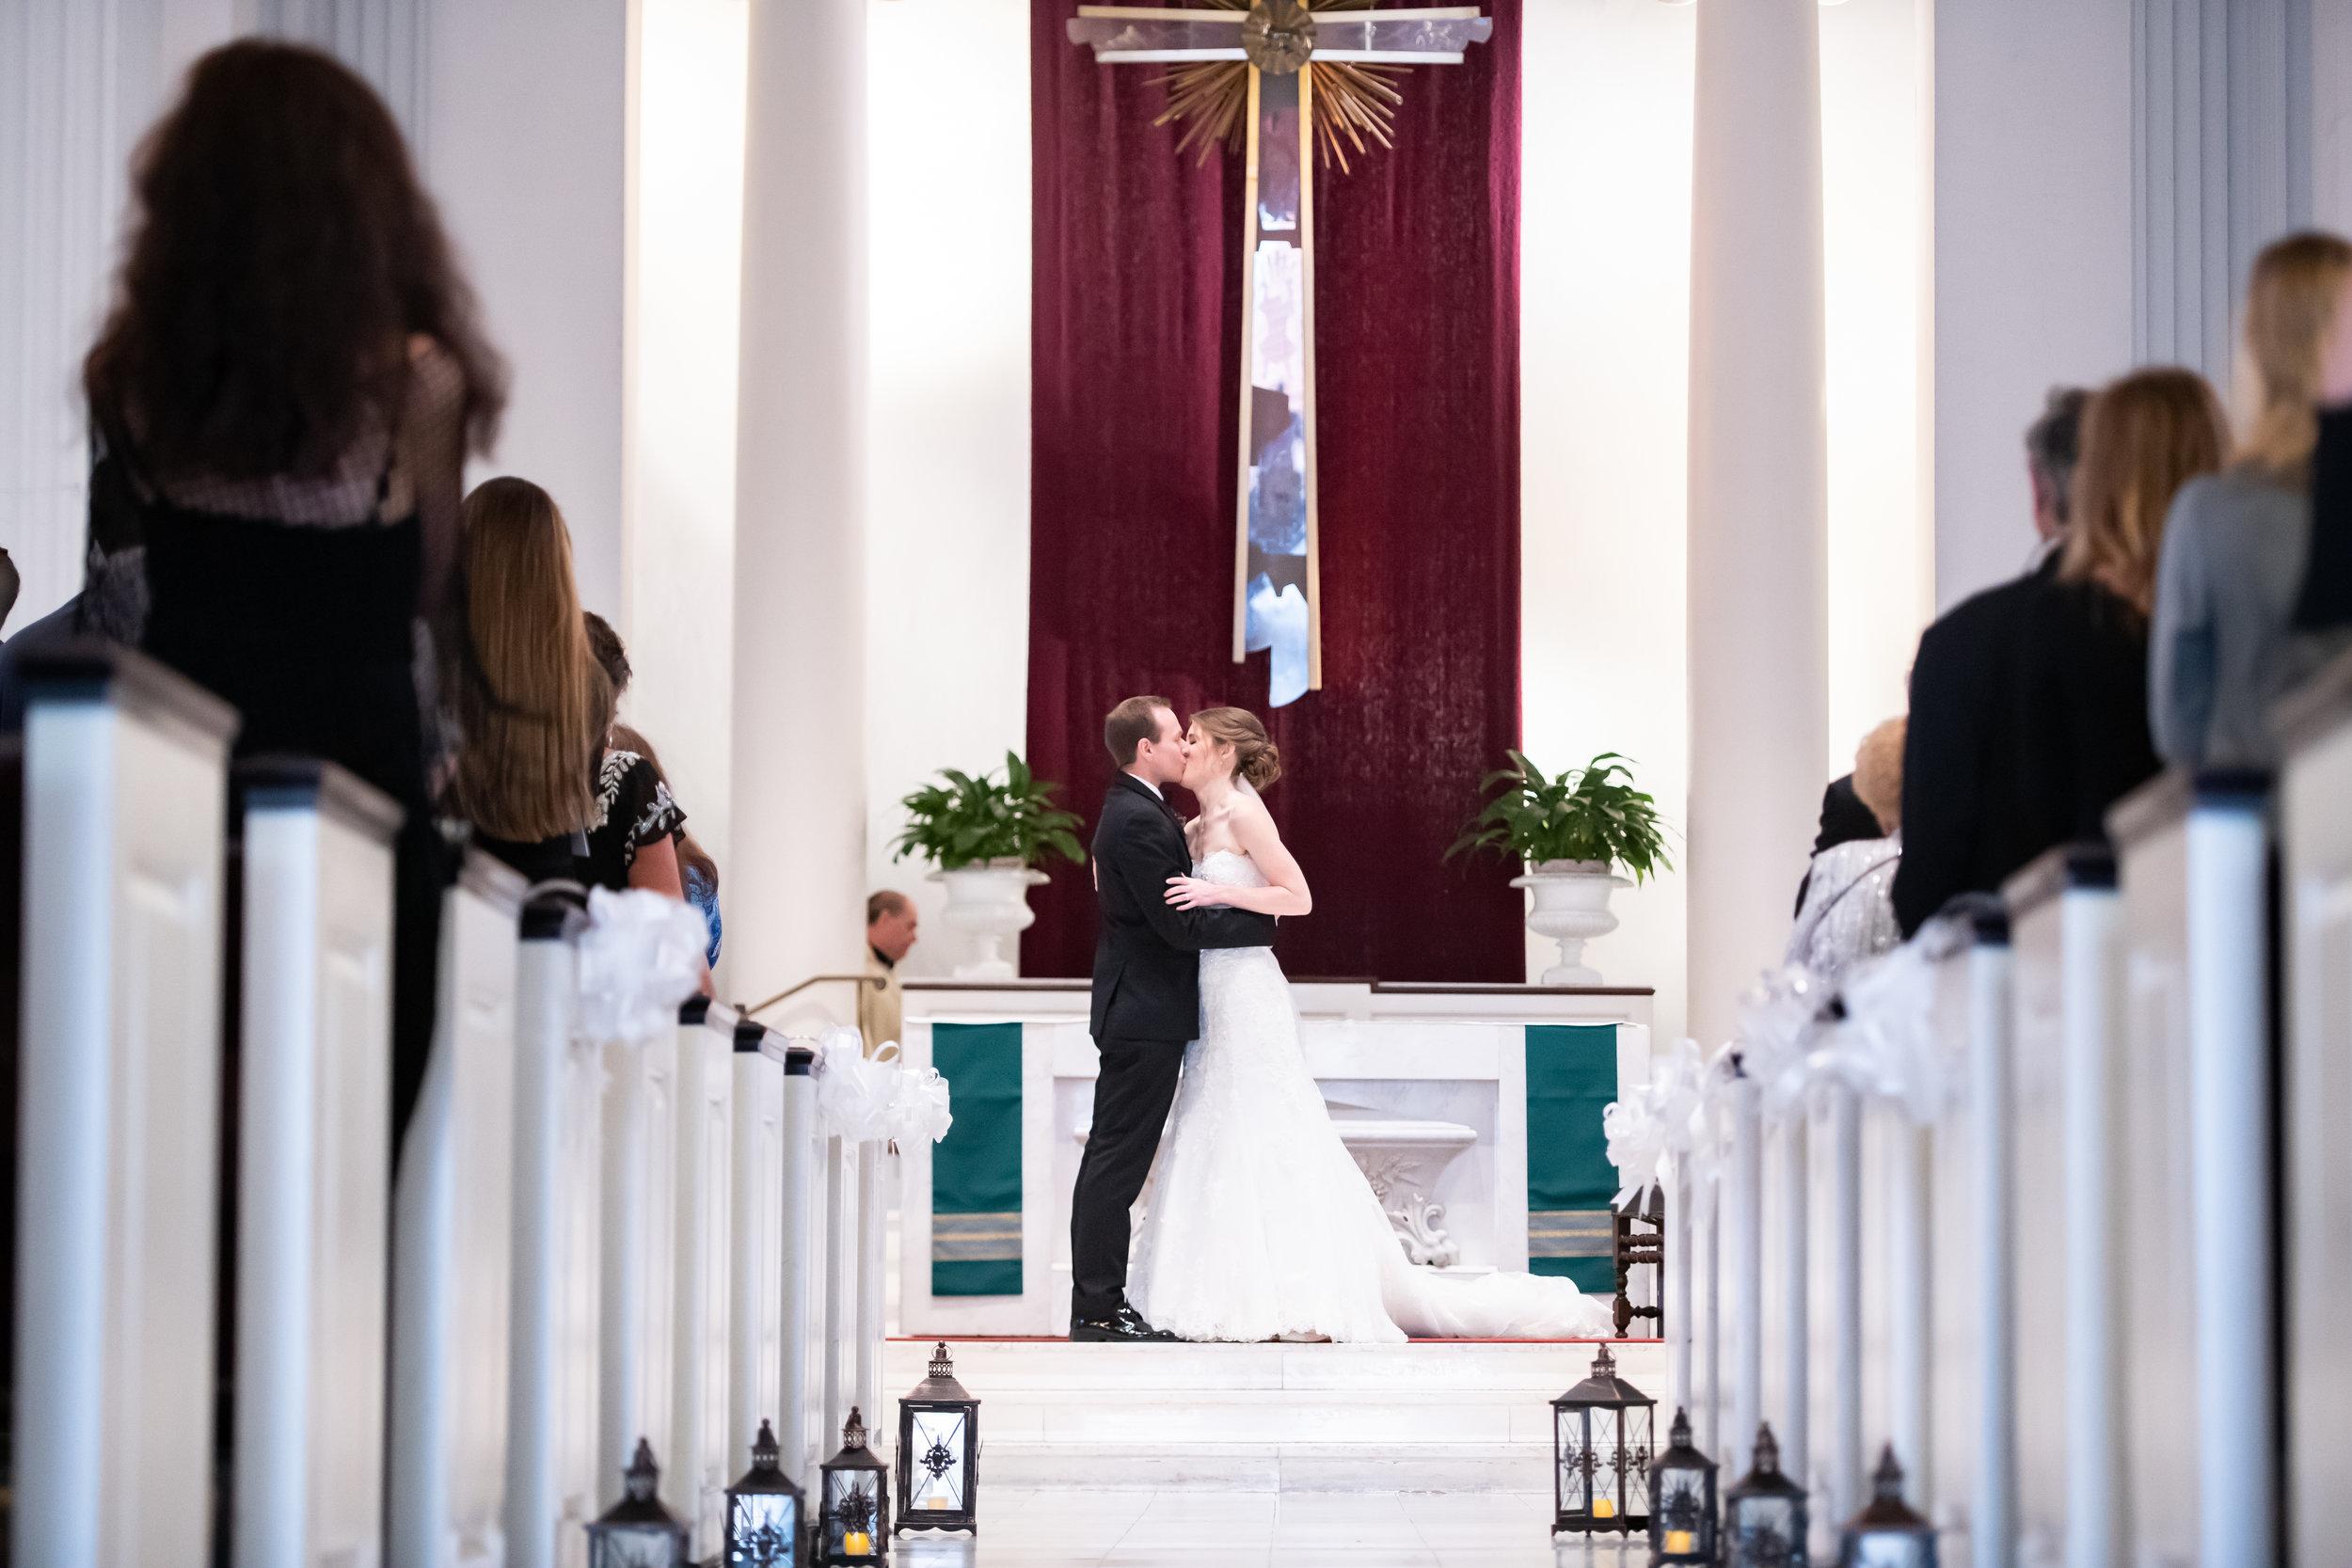 RachelAndrew-MountVernonInn-Wedding-410.jpg